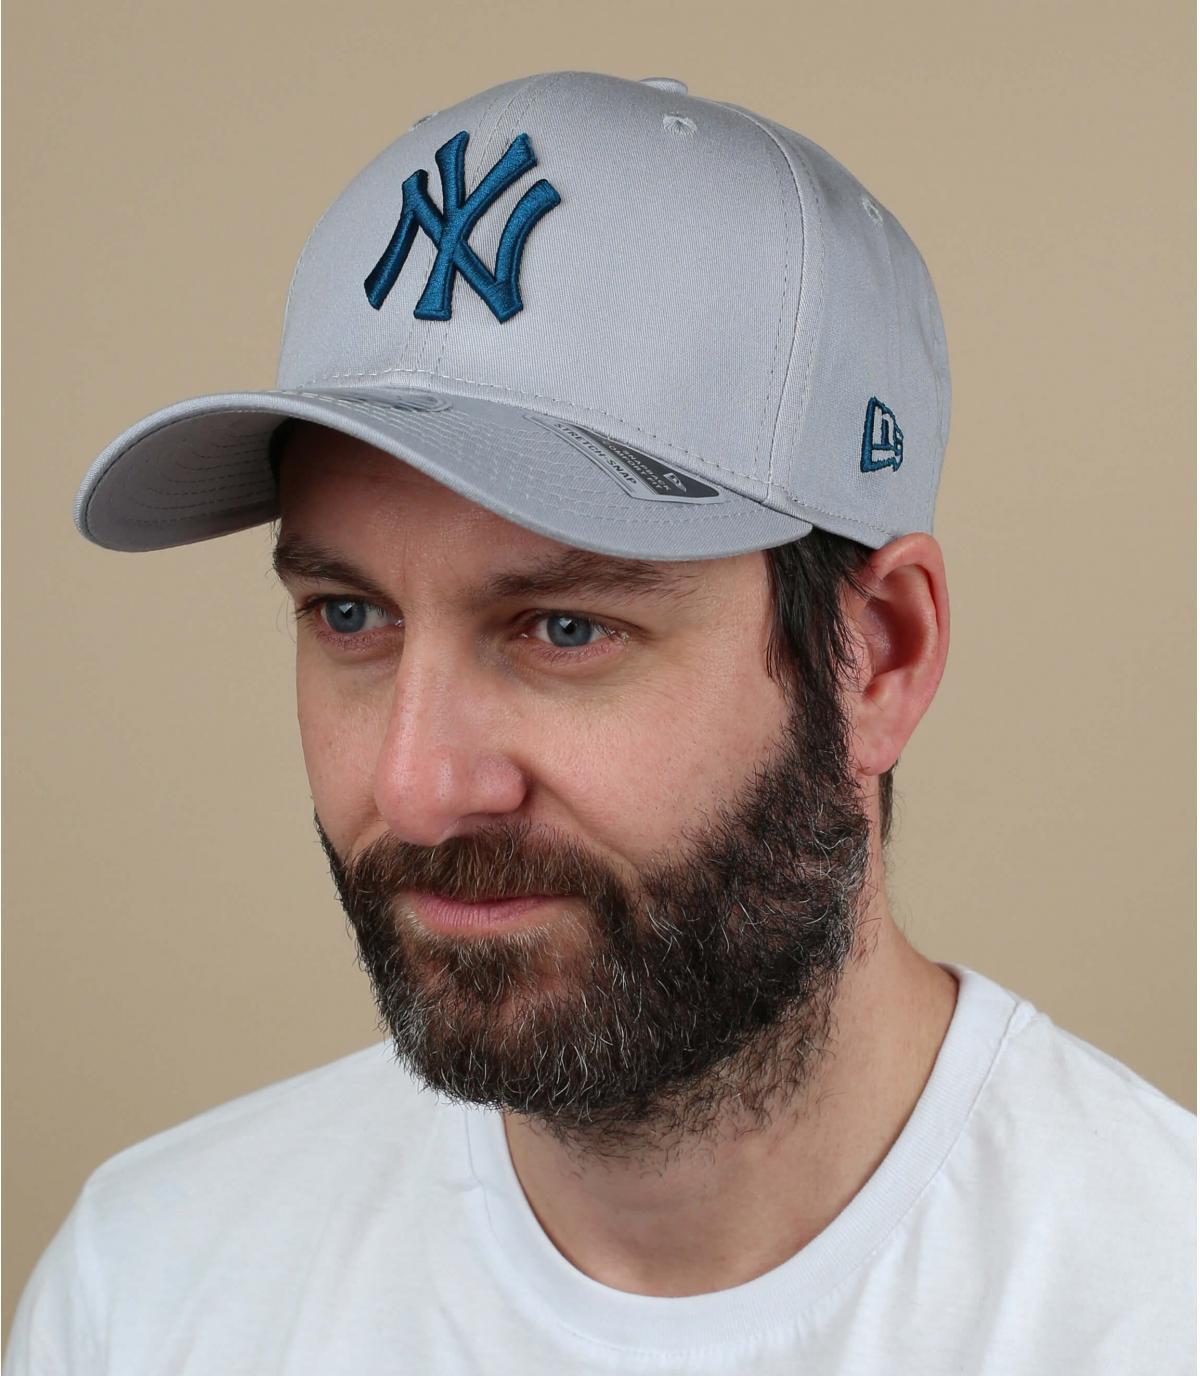 gorra NY azul gris